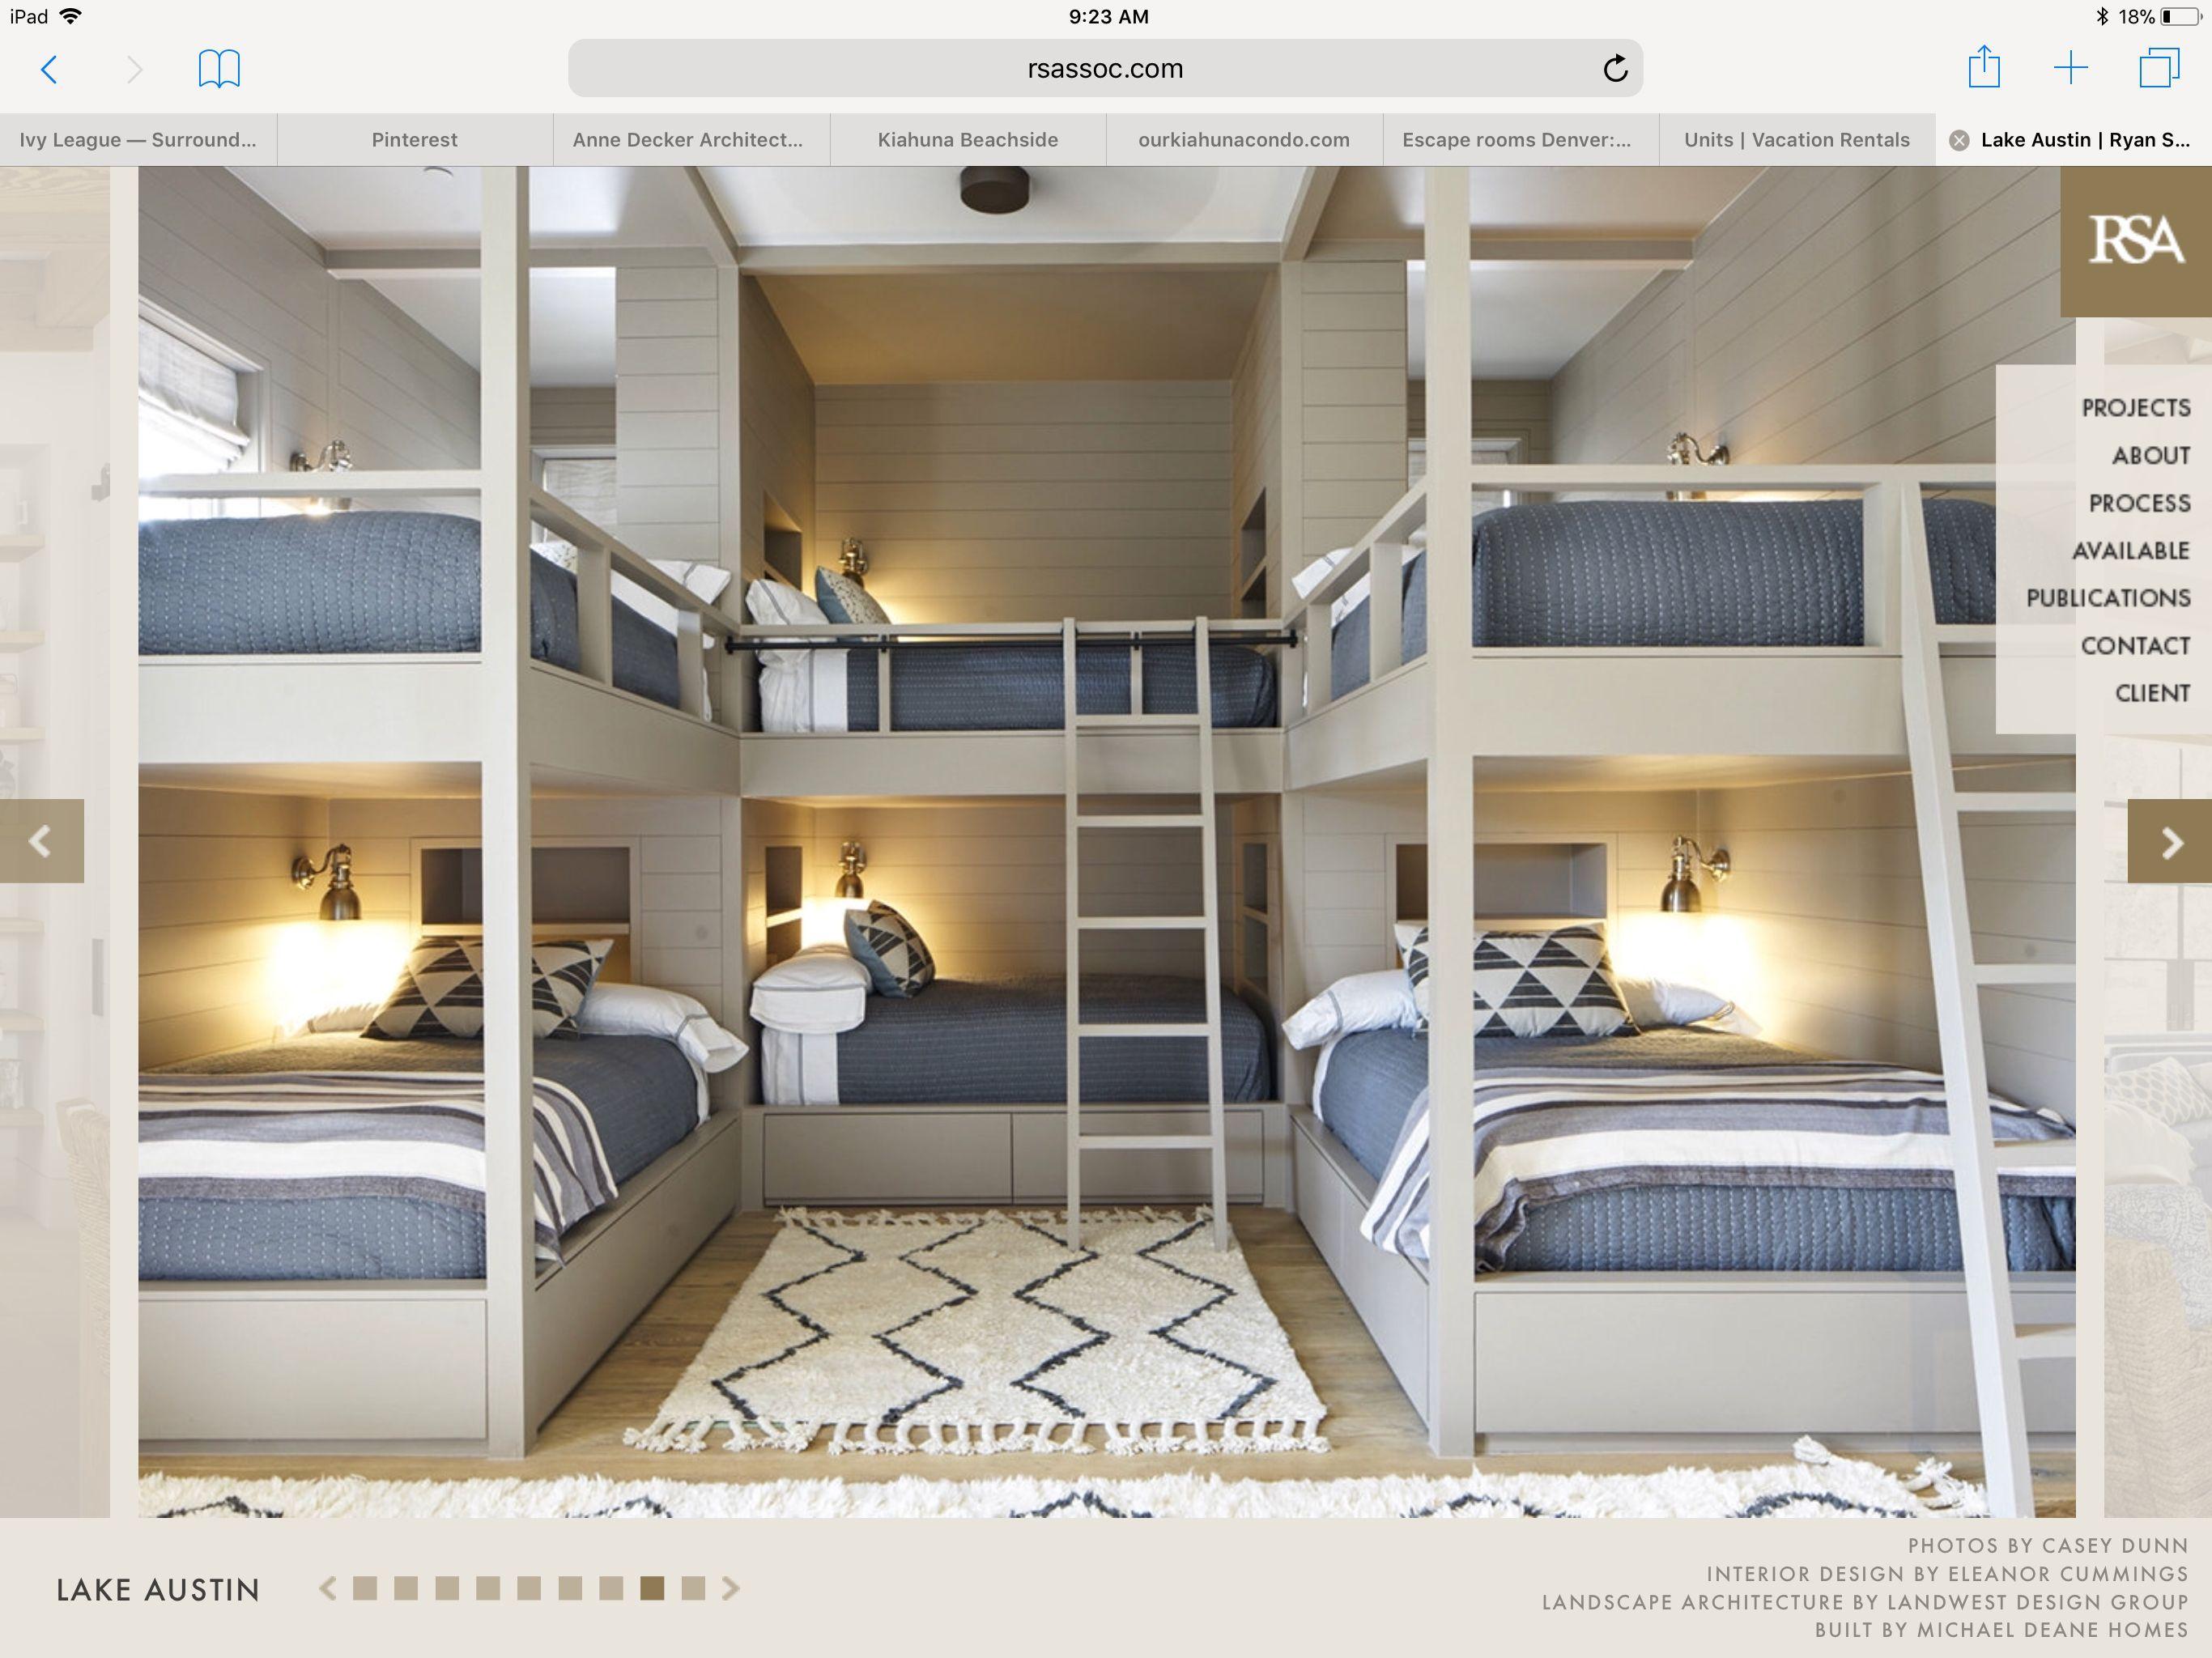 Full Size Bunks Salvabrani Bunk Bed Rooms Bunk Beds Built In Bunk Rooms